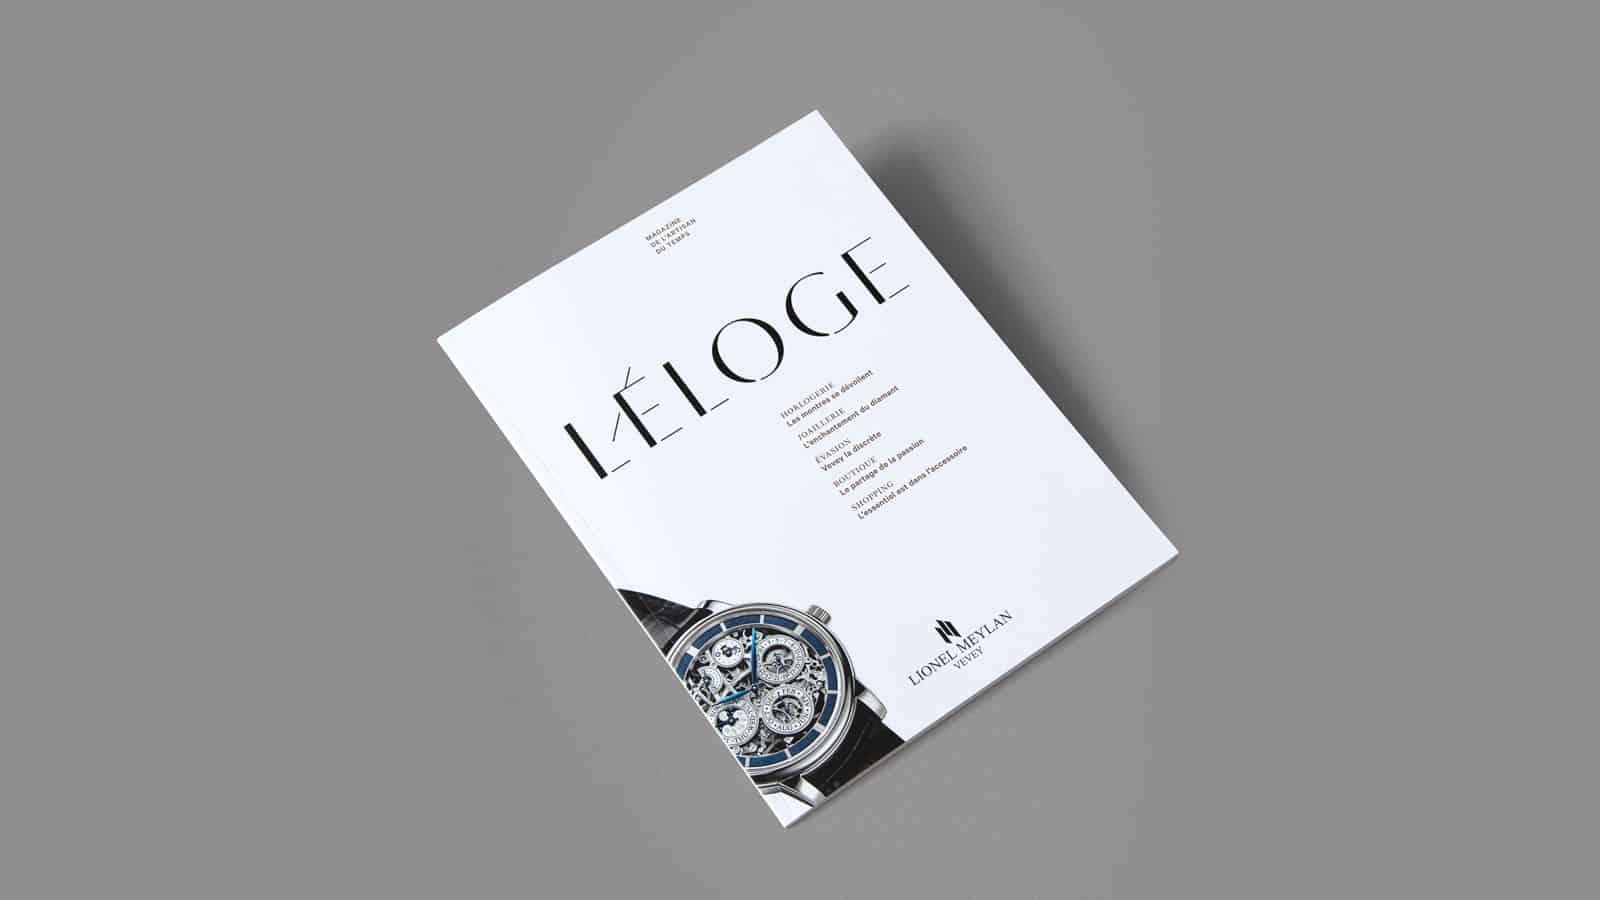 Eloge-magazine-inscription-montre-bijoux-horlogerie-joaillerie-lionel-meylan-vevey-suisse